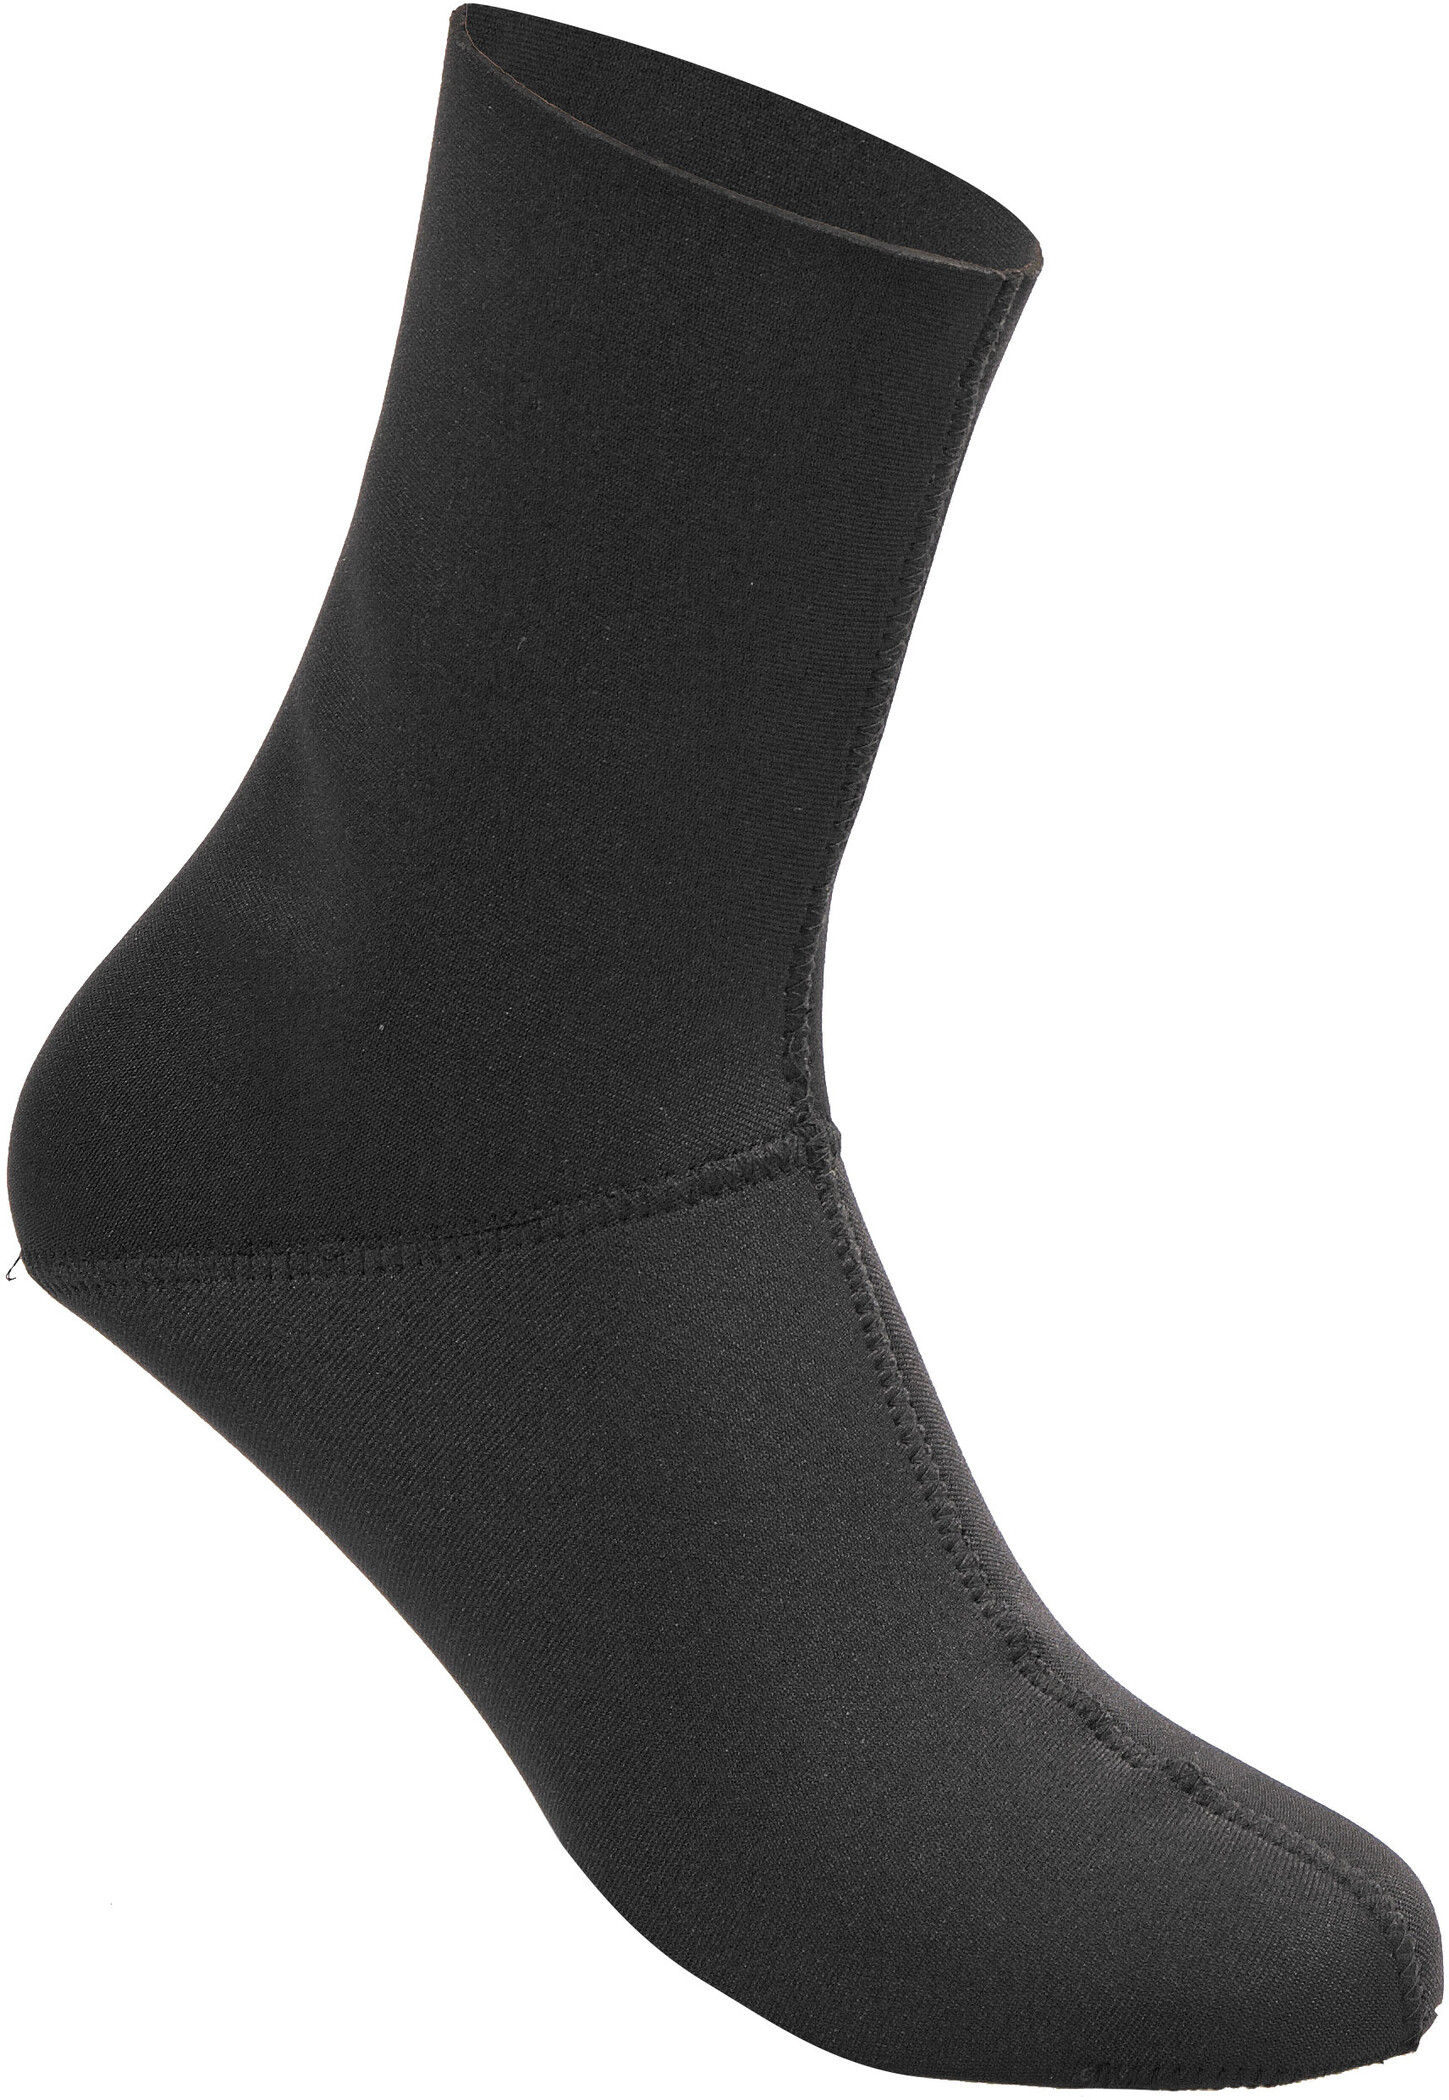 inov-8 Extreme Thermo High Strømper, black (2019)   Socks